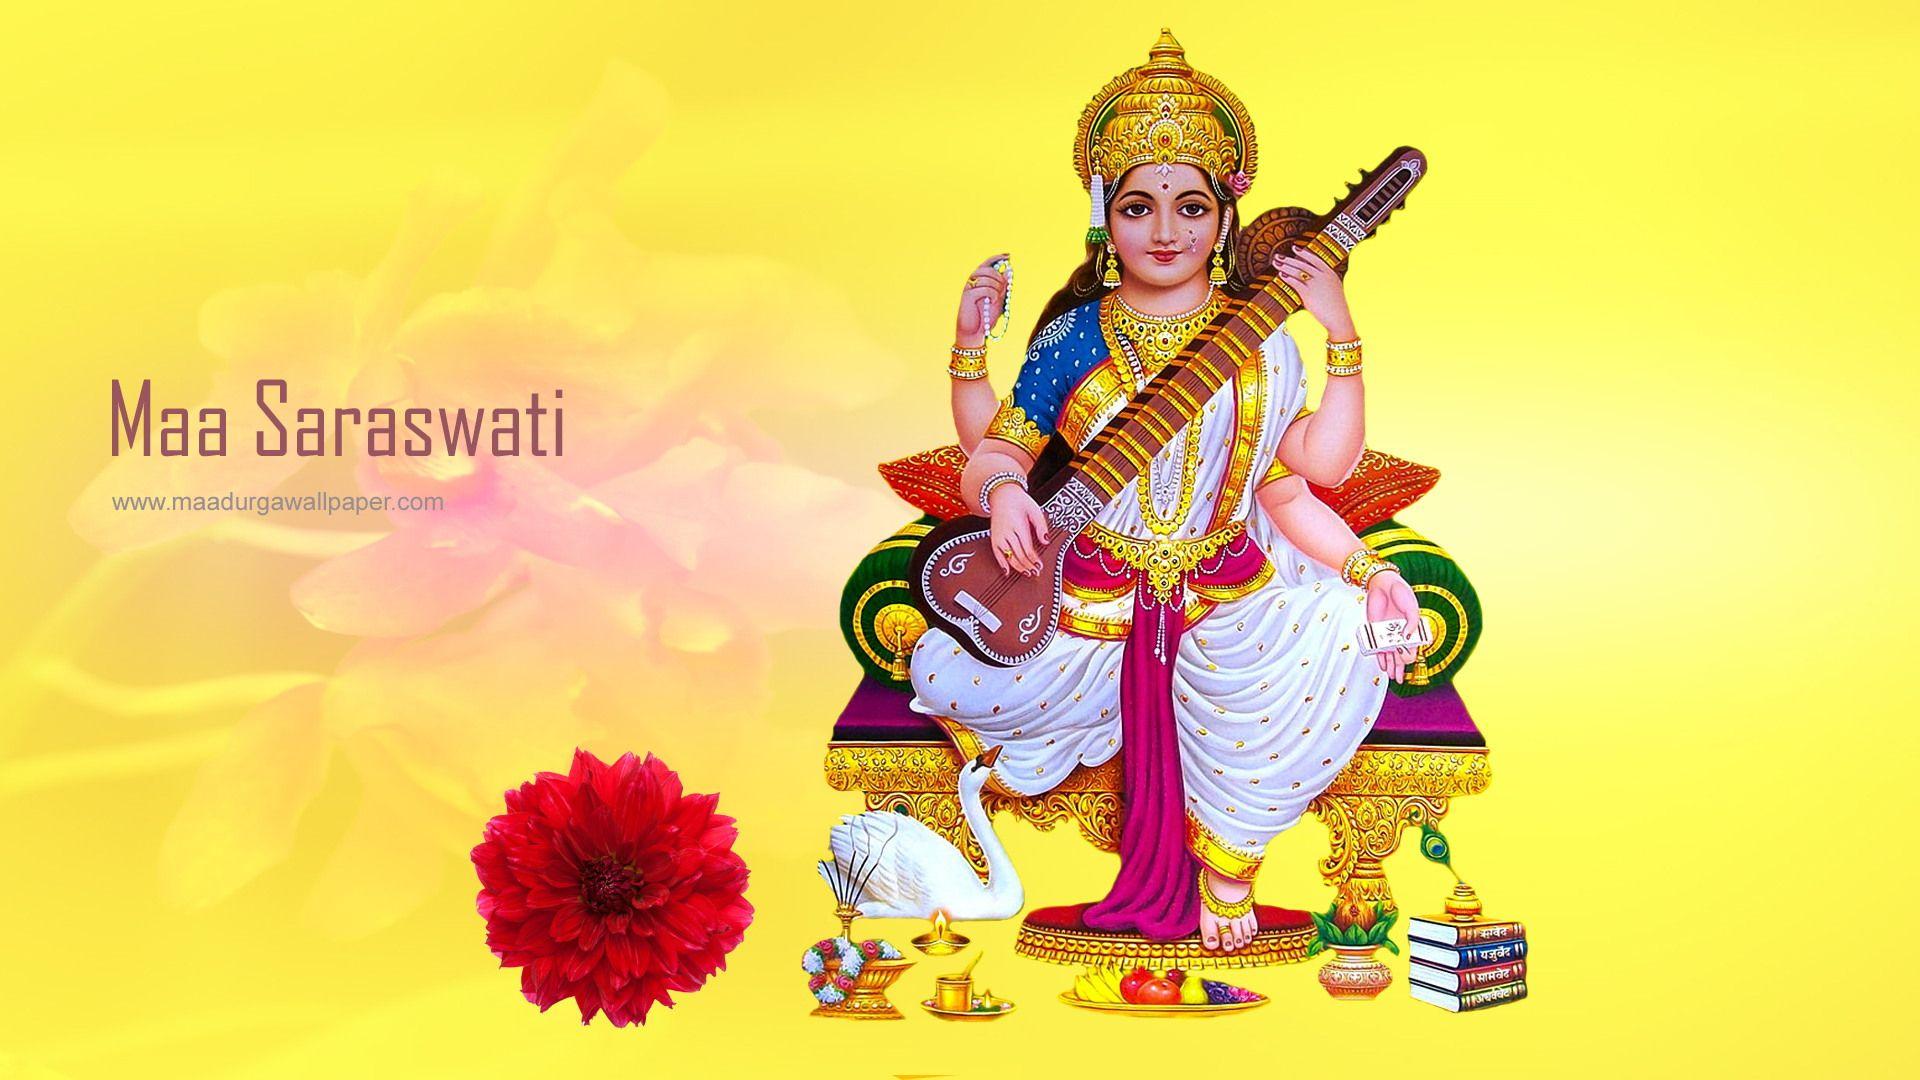 Maa Saraswati Hd Wallpaper Free Download Wallpaper Free Download Basant Panchami Indian Festivals